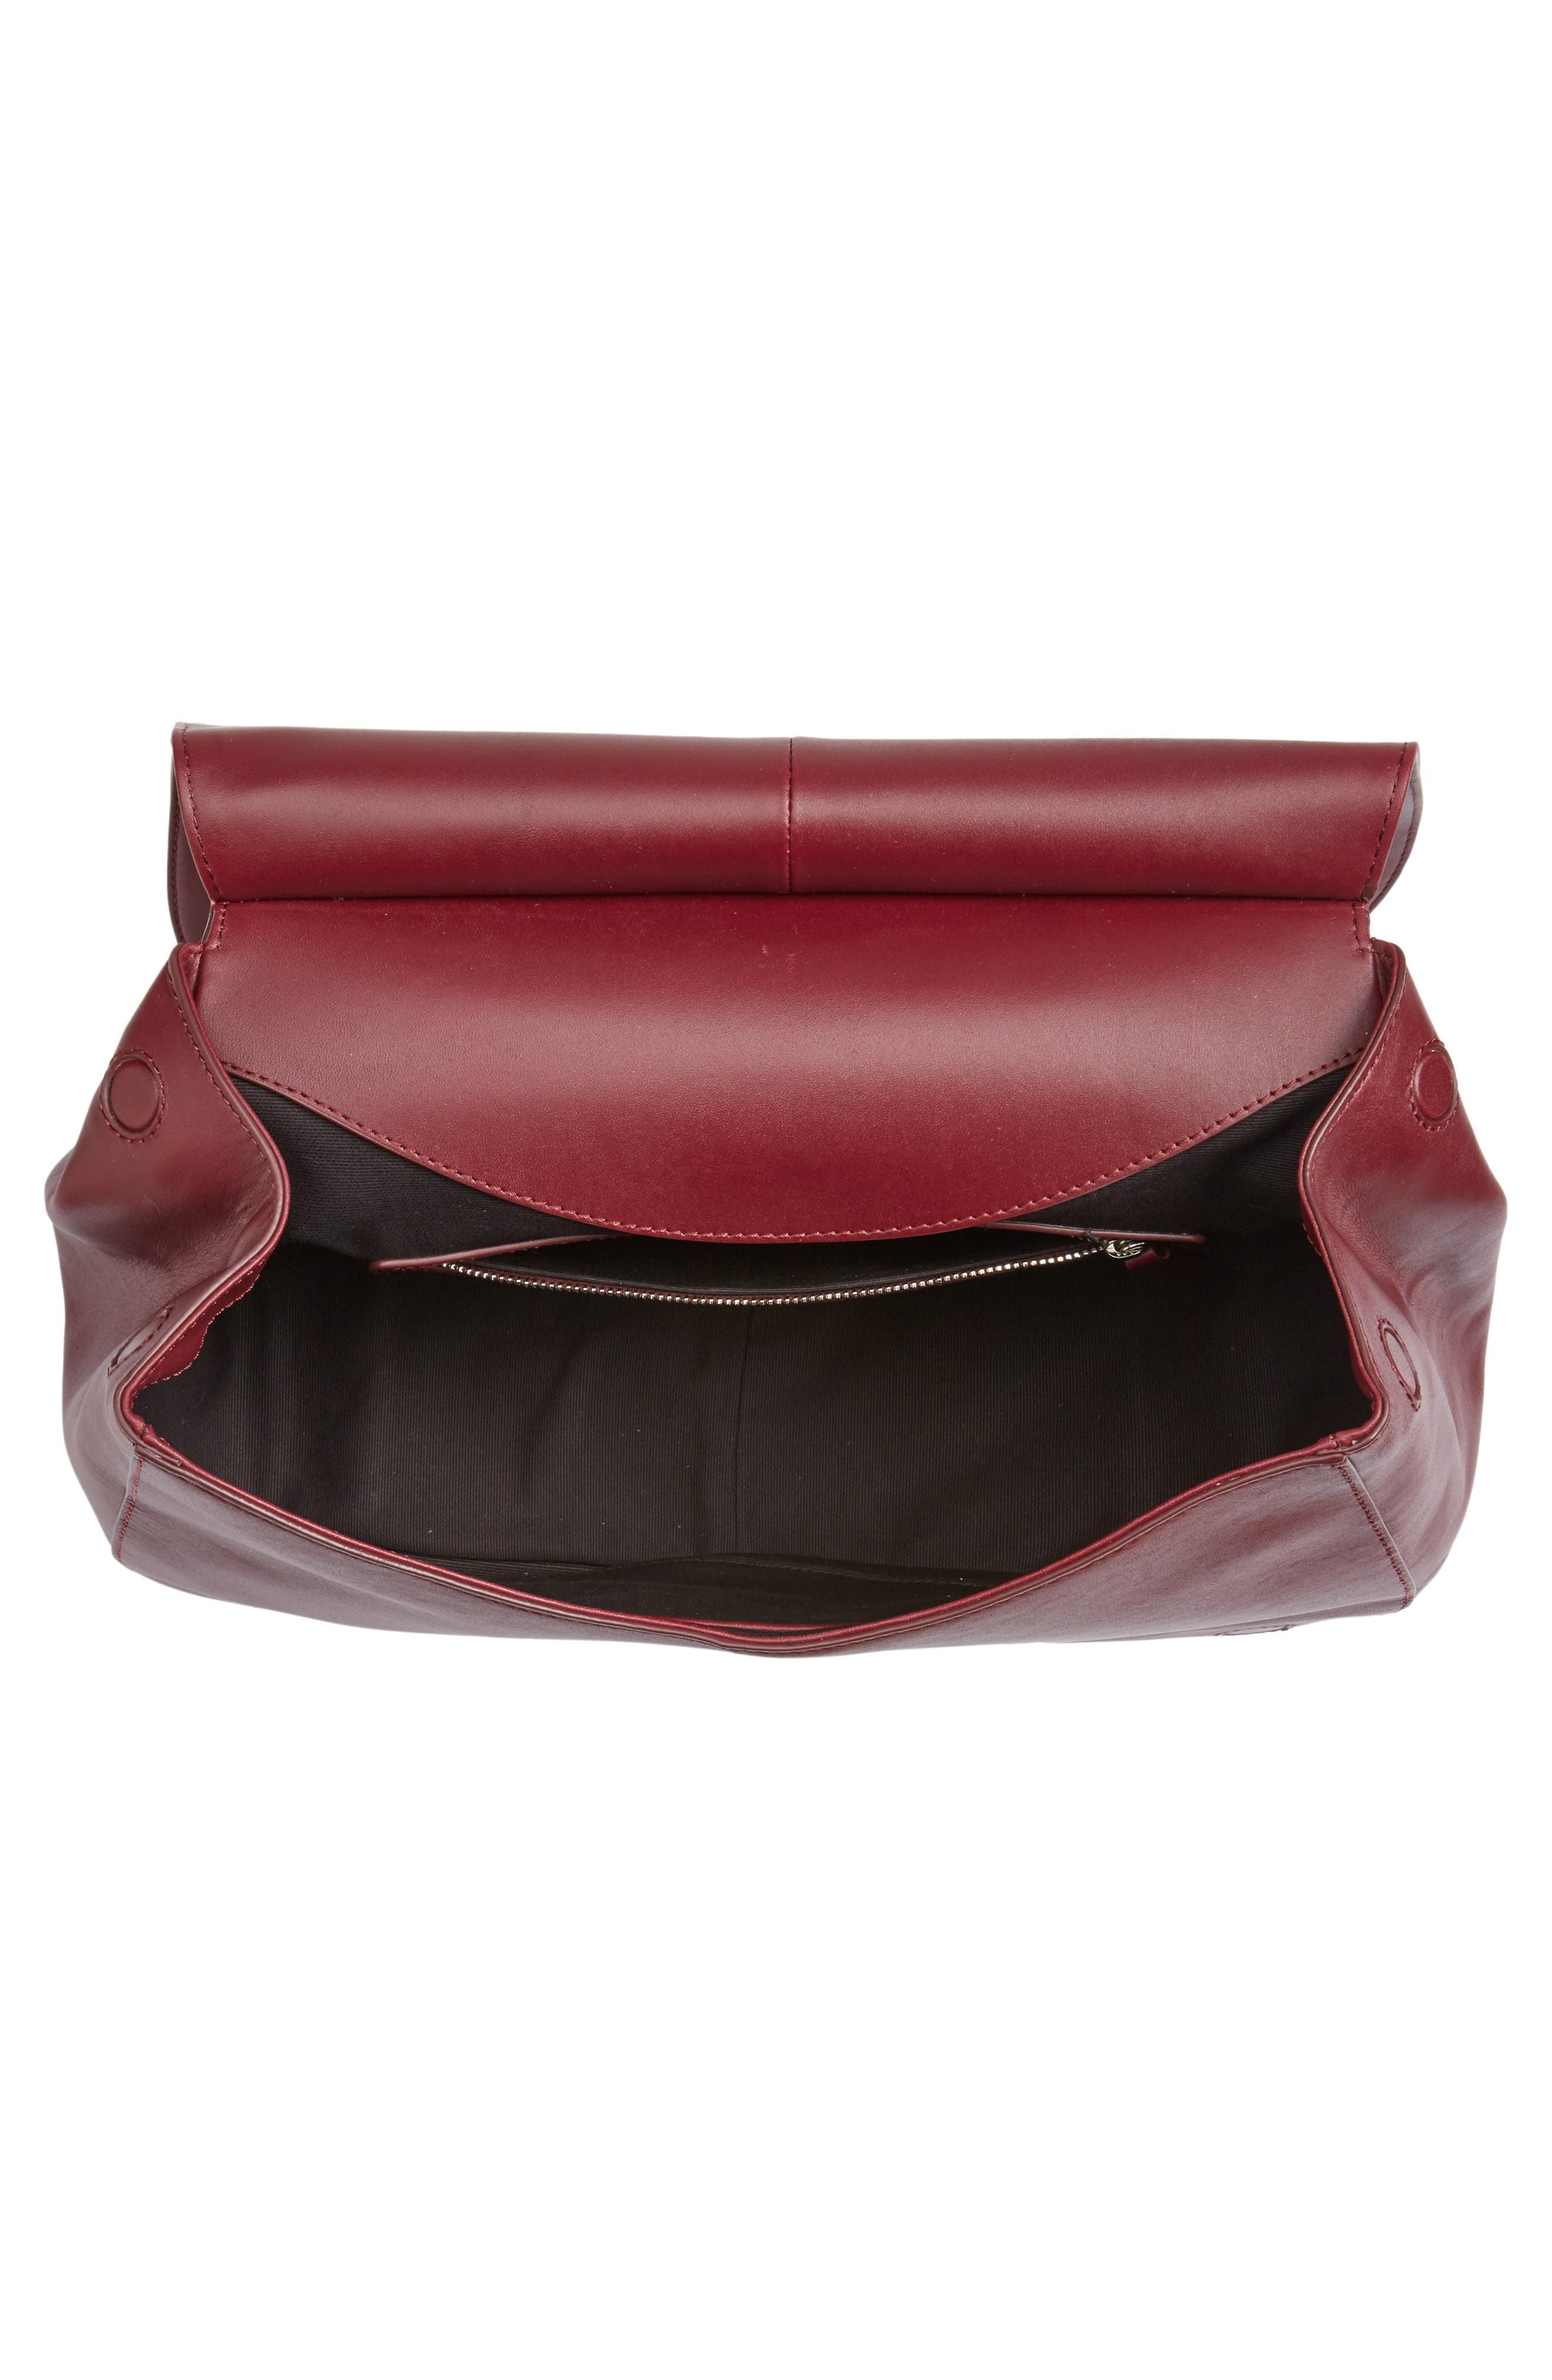 Alternate Image 3  - Steve Alan Kate Leather Flap Satchel